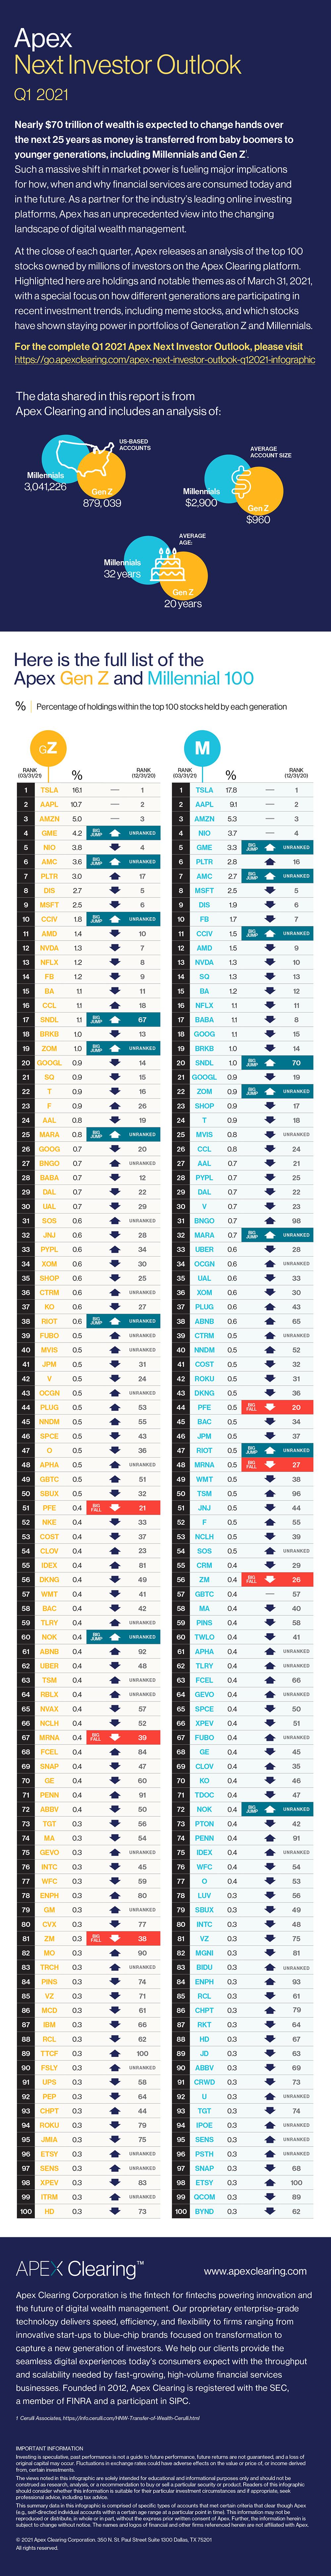 Q1 2021 Apex Next Investor Outlook Top 100